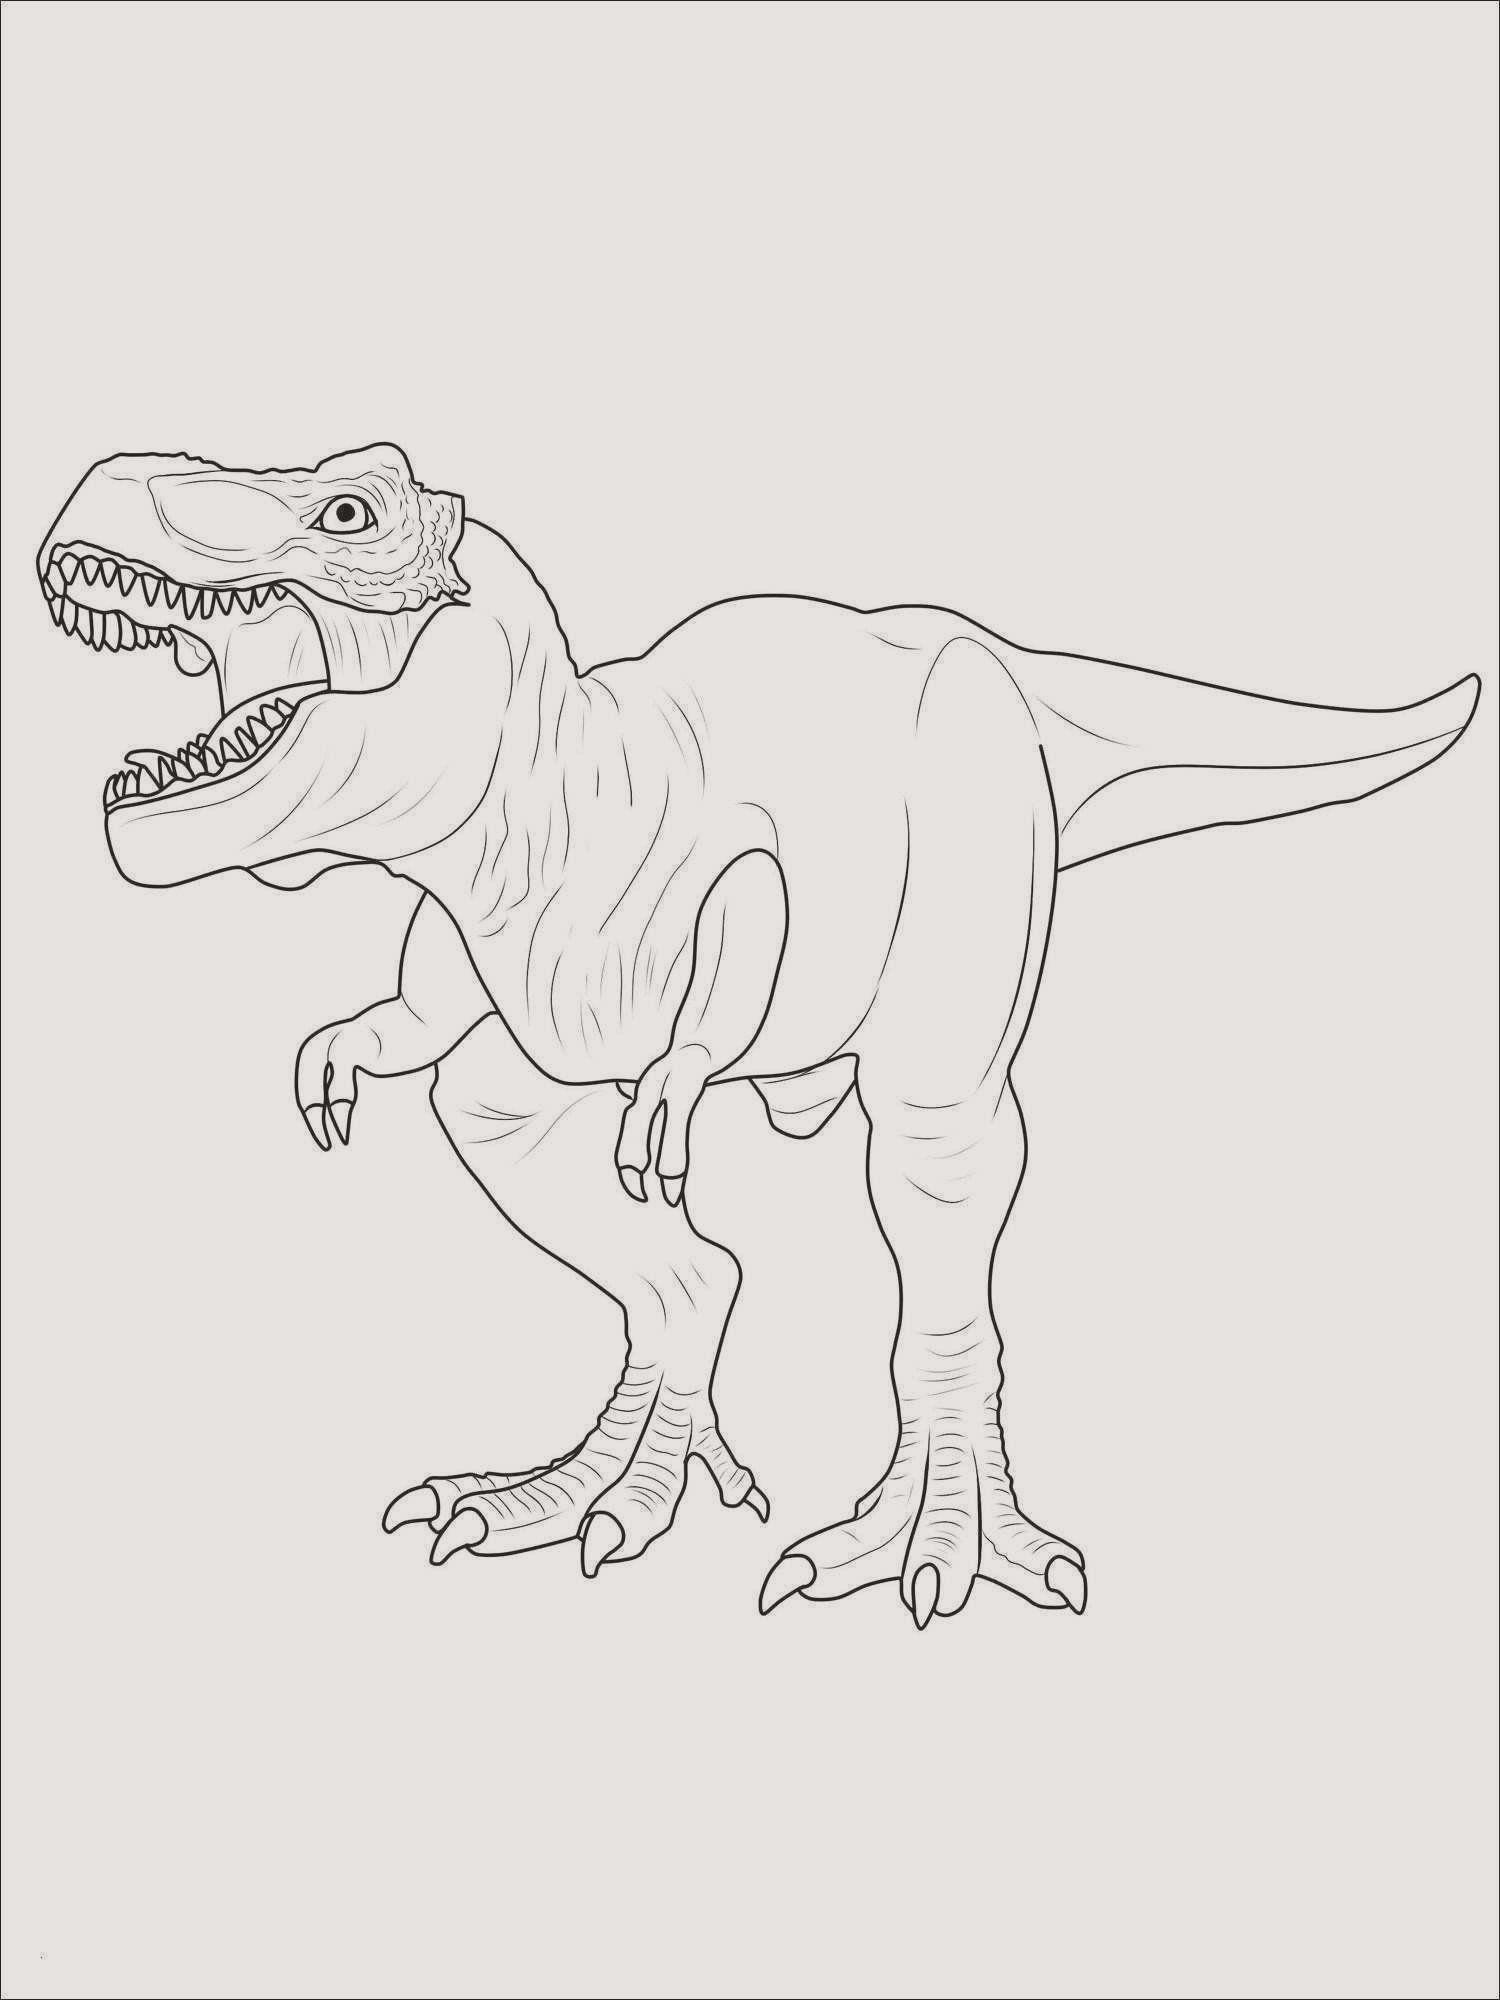 T Rex Coloring Pages Best Of 30 Neu Tyrannosaurus Rex Ausmalbilder Ausdrucken Dinosaur Coloring Pages Dinosaur Coloring Coloring Pages For Kids